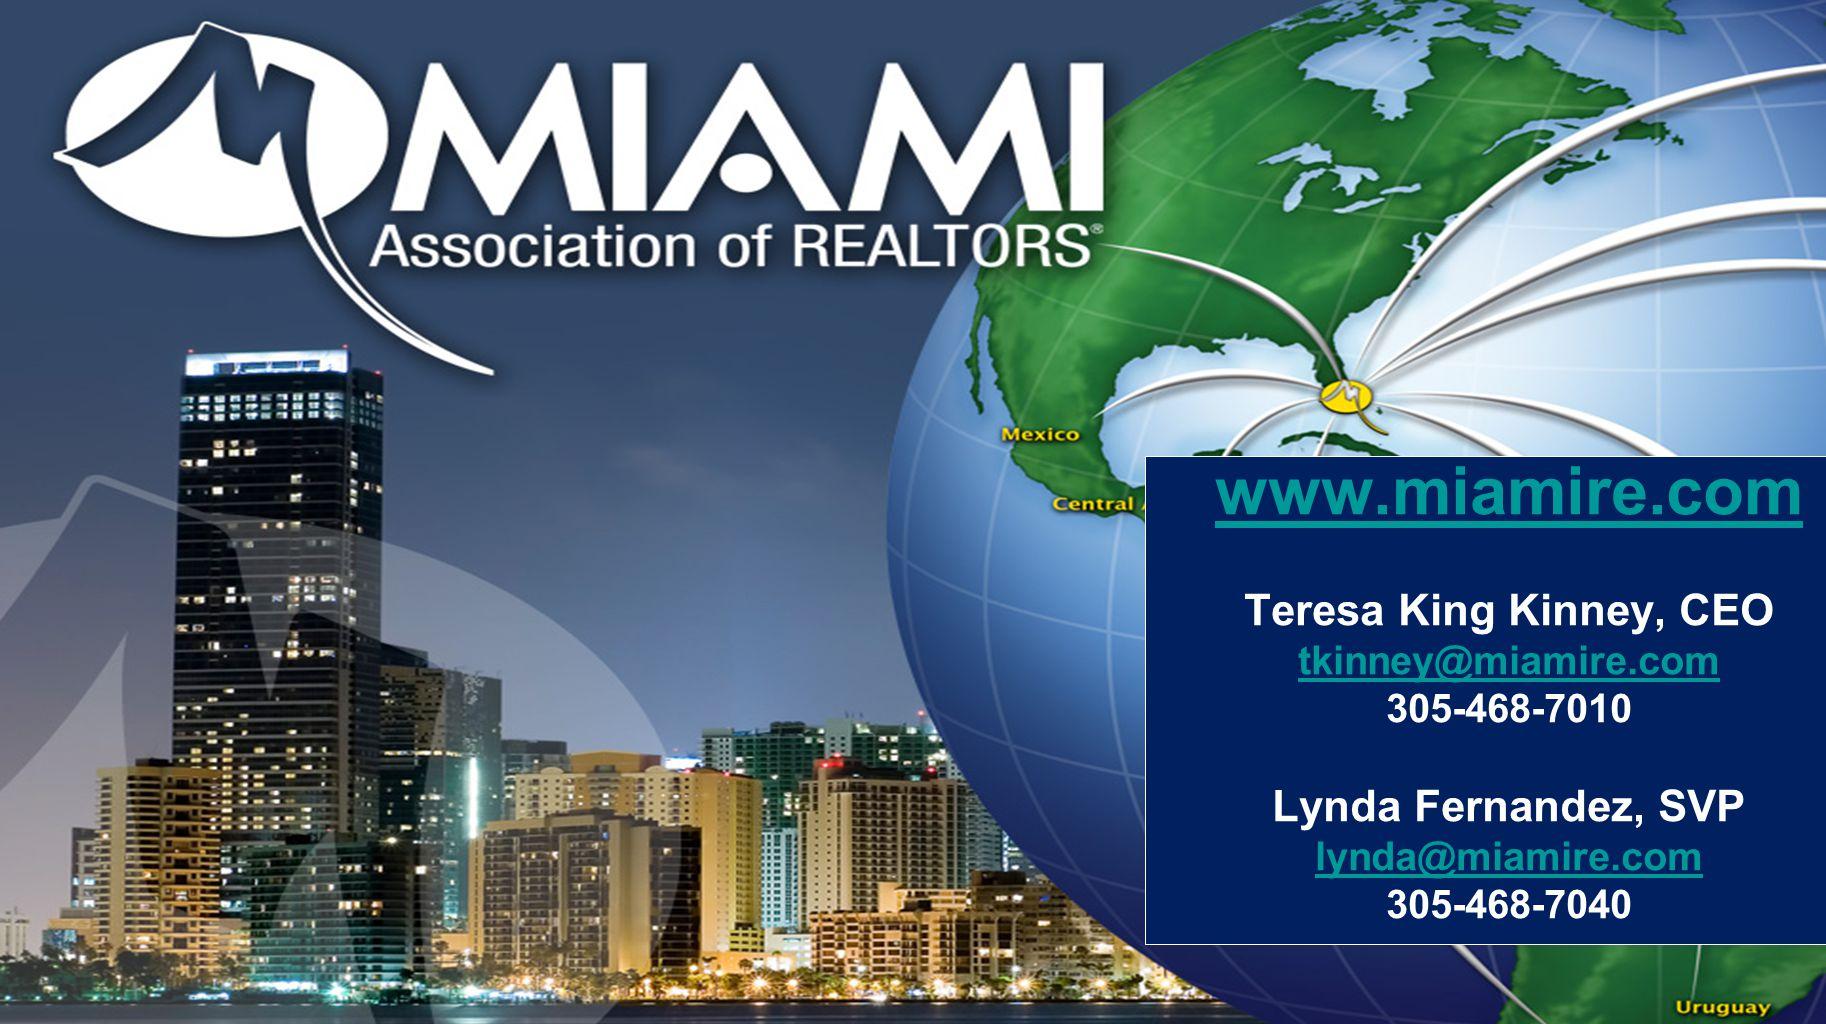 www.miamire.com Teresa King Kinney, CEO tkinney@miamire.com 305-468-7010 Lynda Fernandez, SVP lynda@miamire.com 305-468-7040